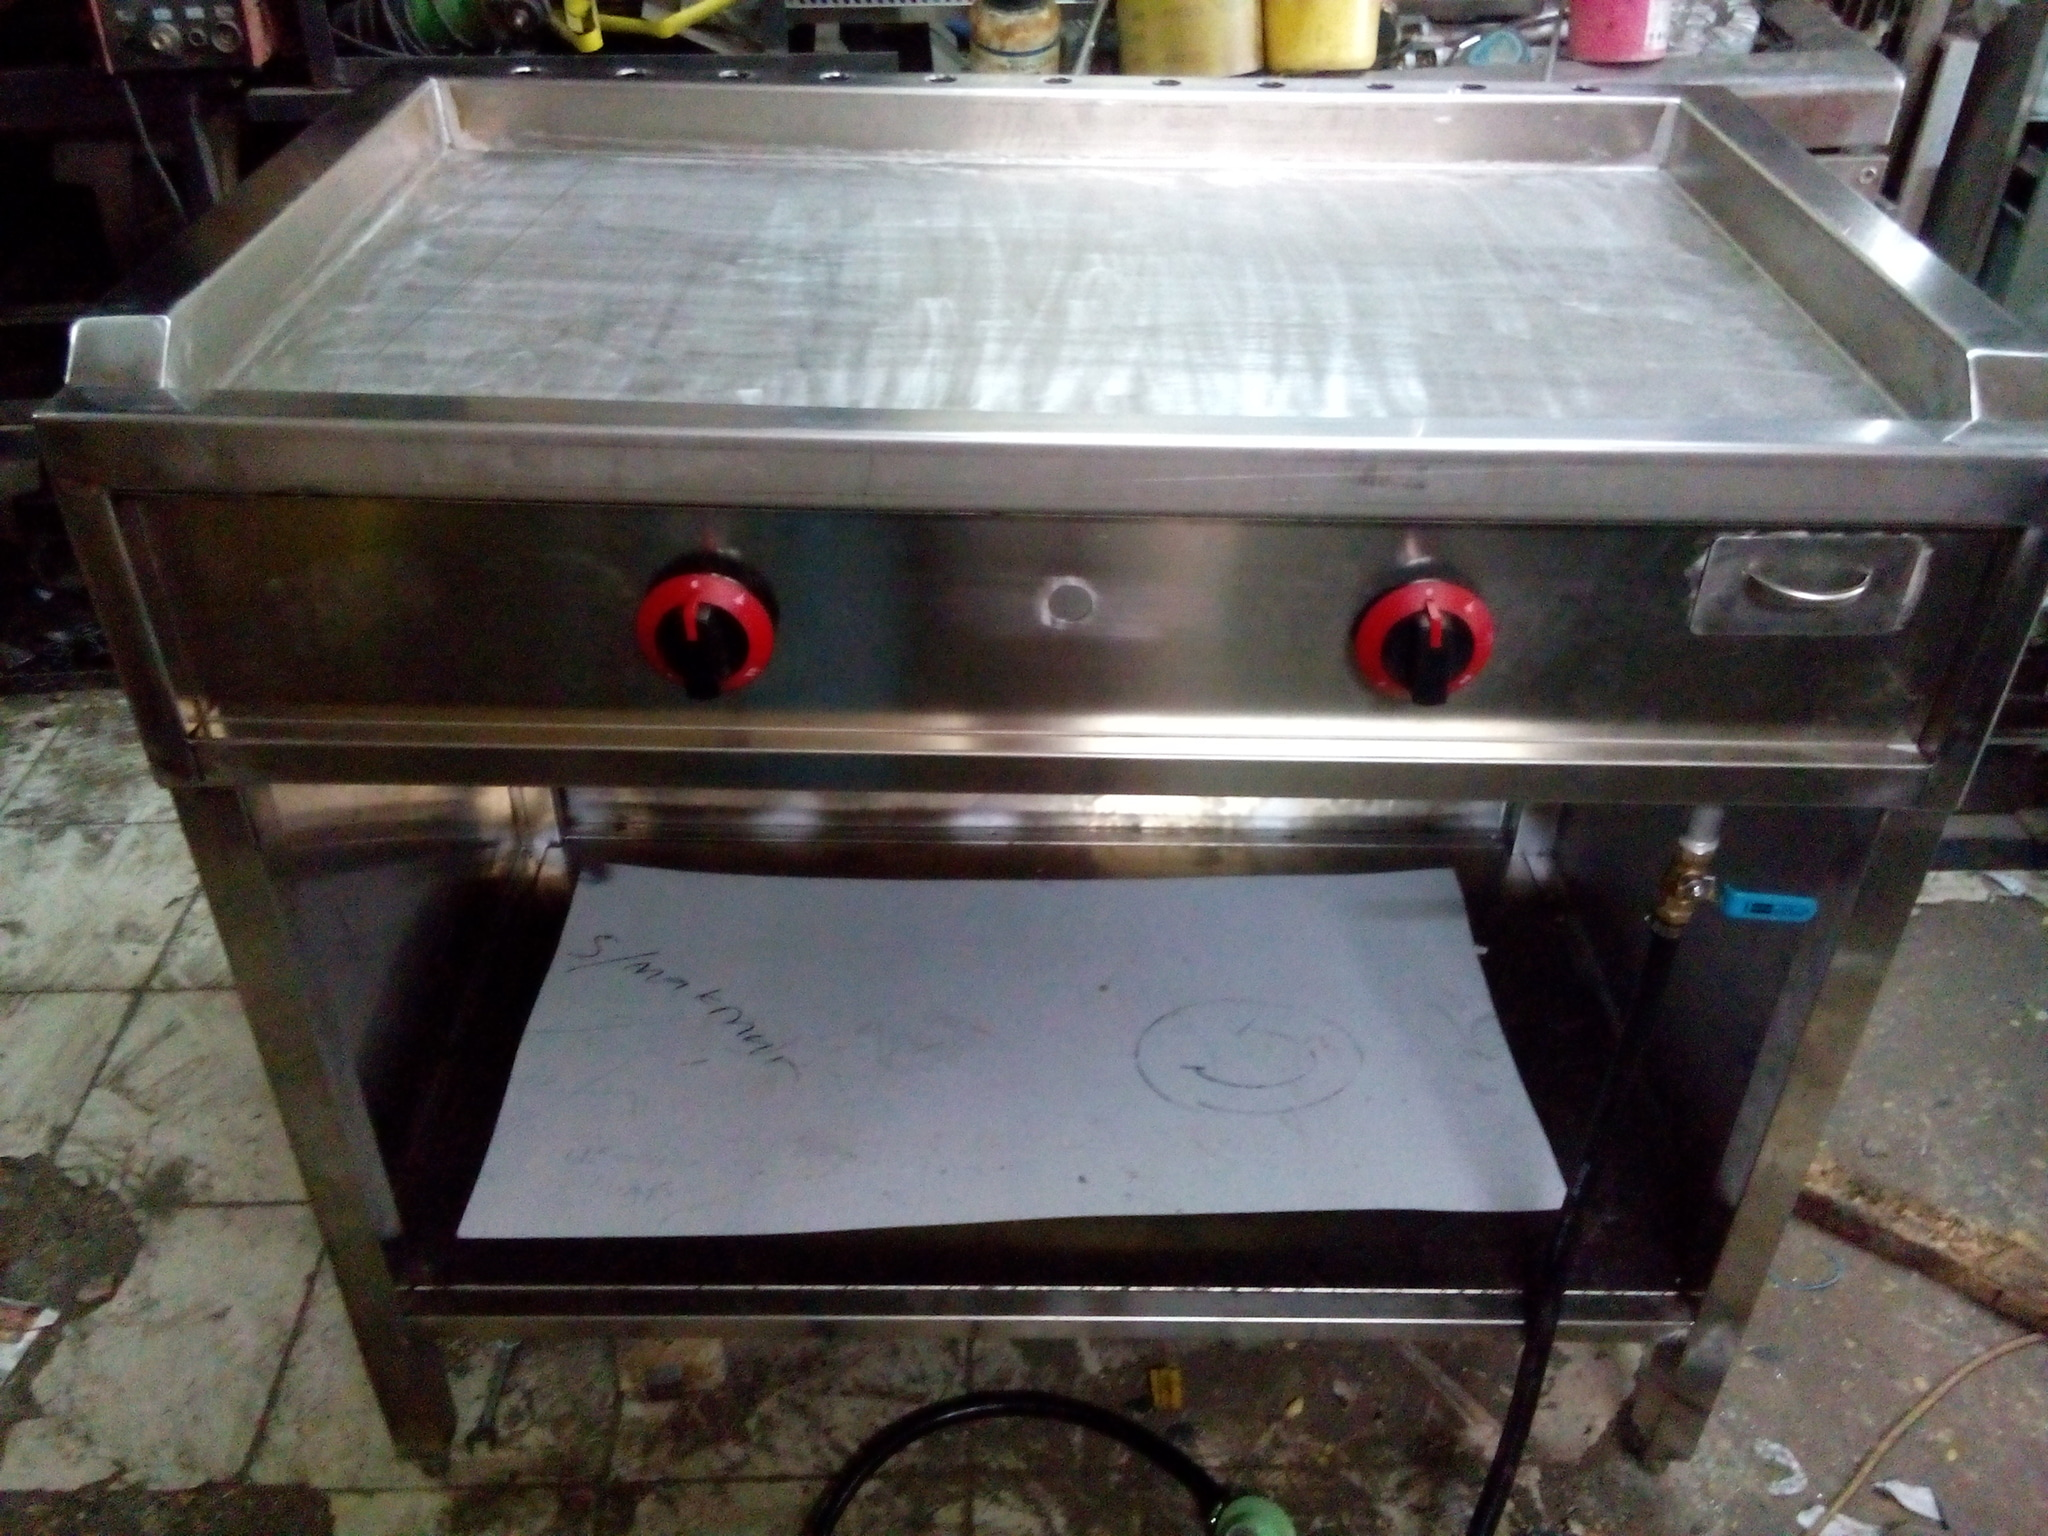 Jual Griddle Gas Tepanyaki Portable Burger Grill Flat Top Surya Makmur Tokopedia